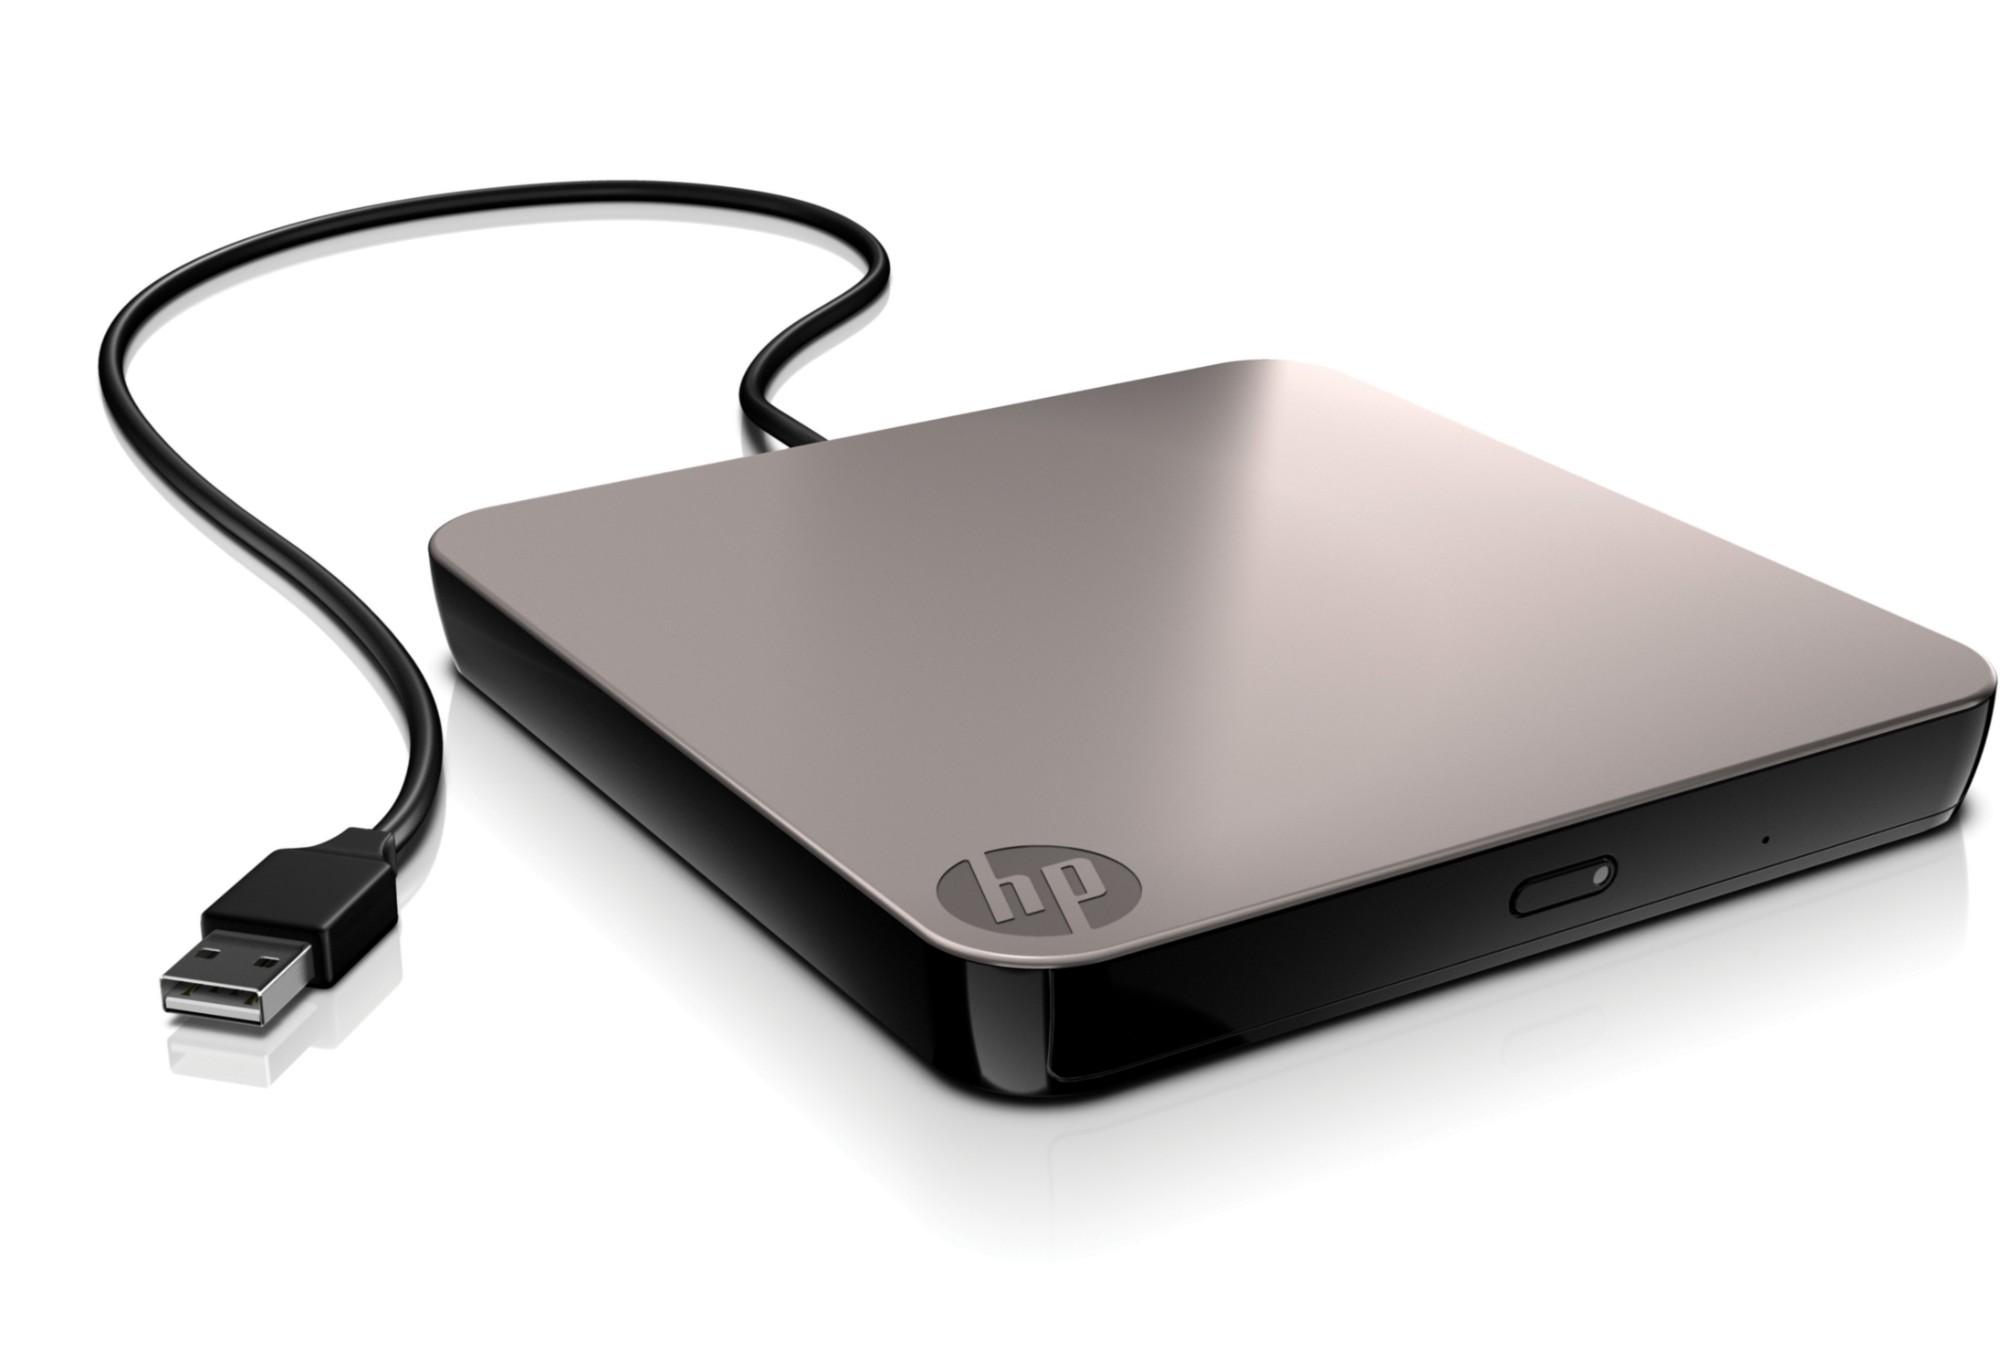 HP Mobile USB NLS DVD-RW Drive optical disc drive DVD-�RW Black